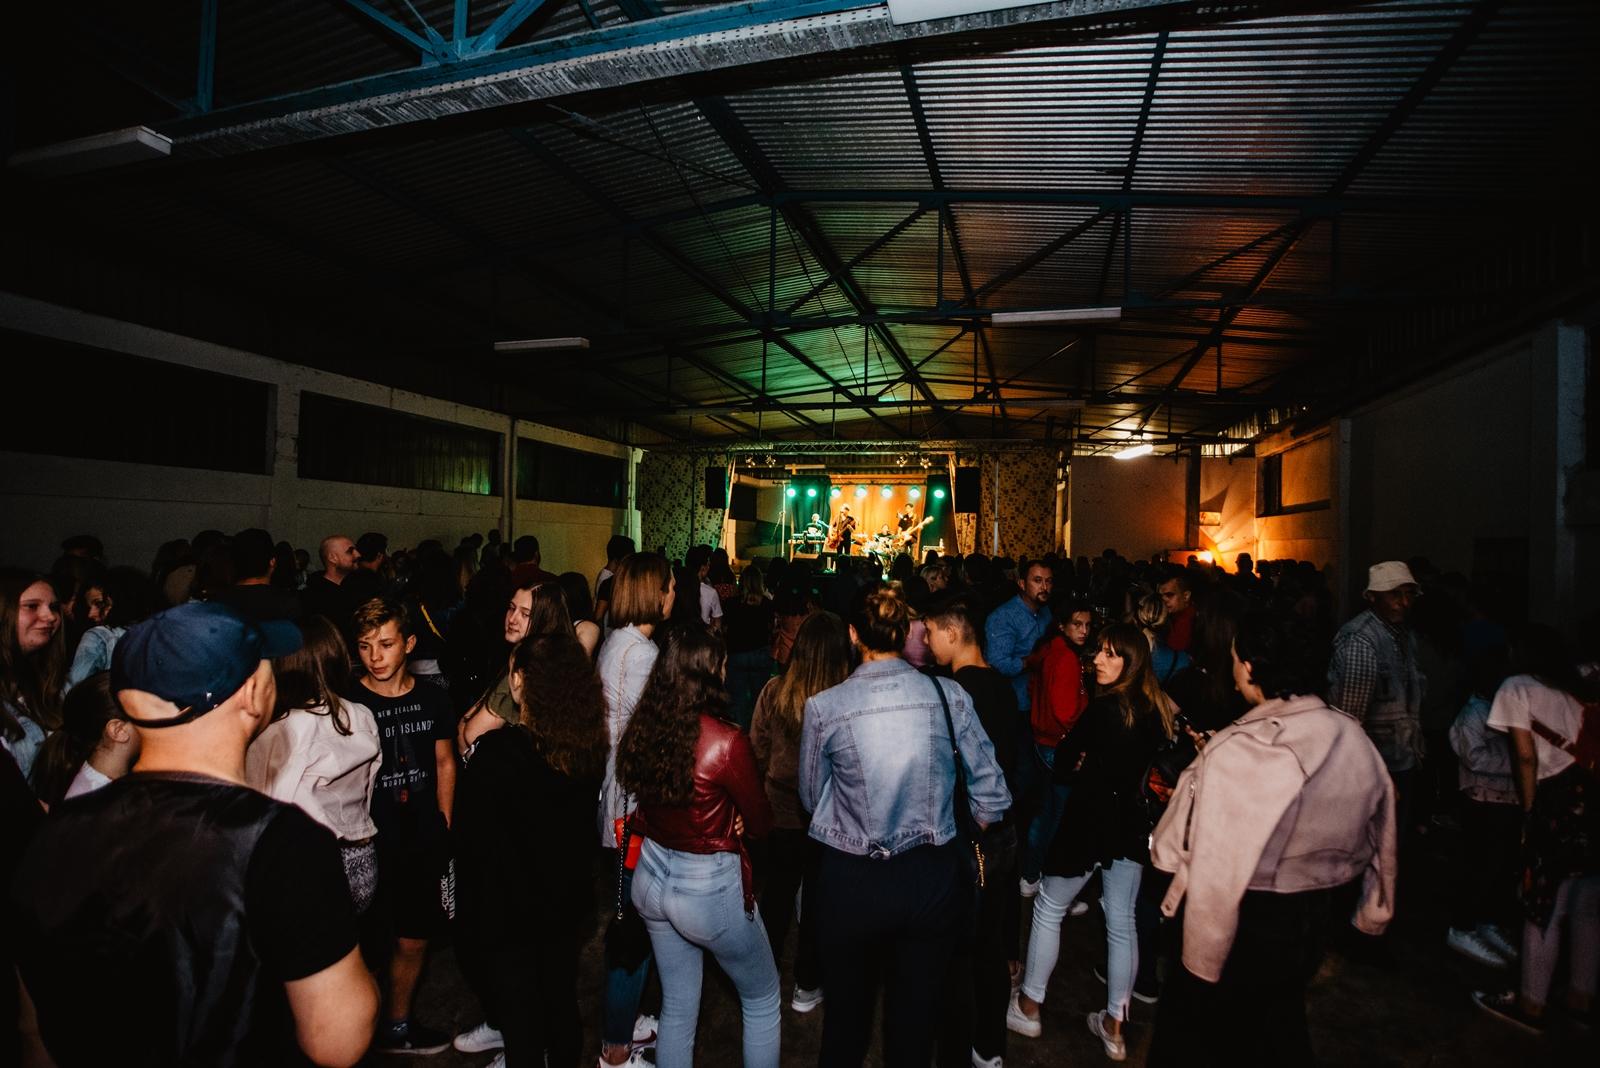 likaclub_korenica_neno-belan_2019-30